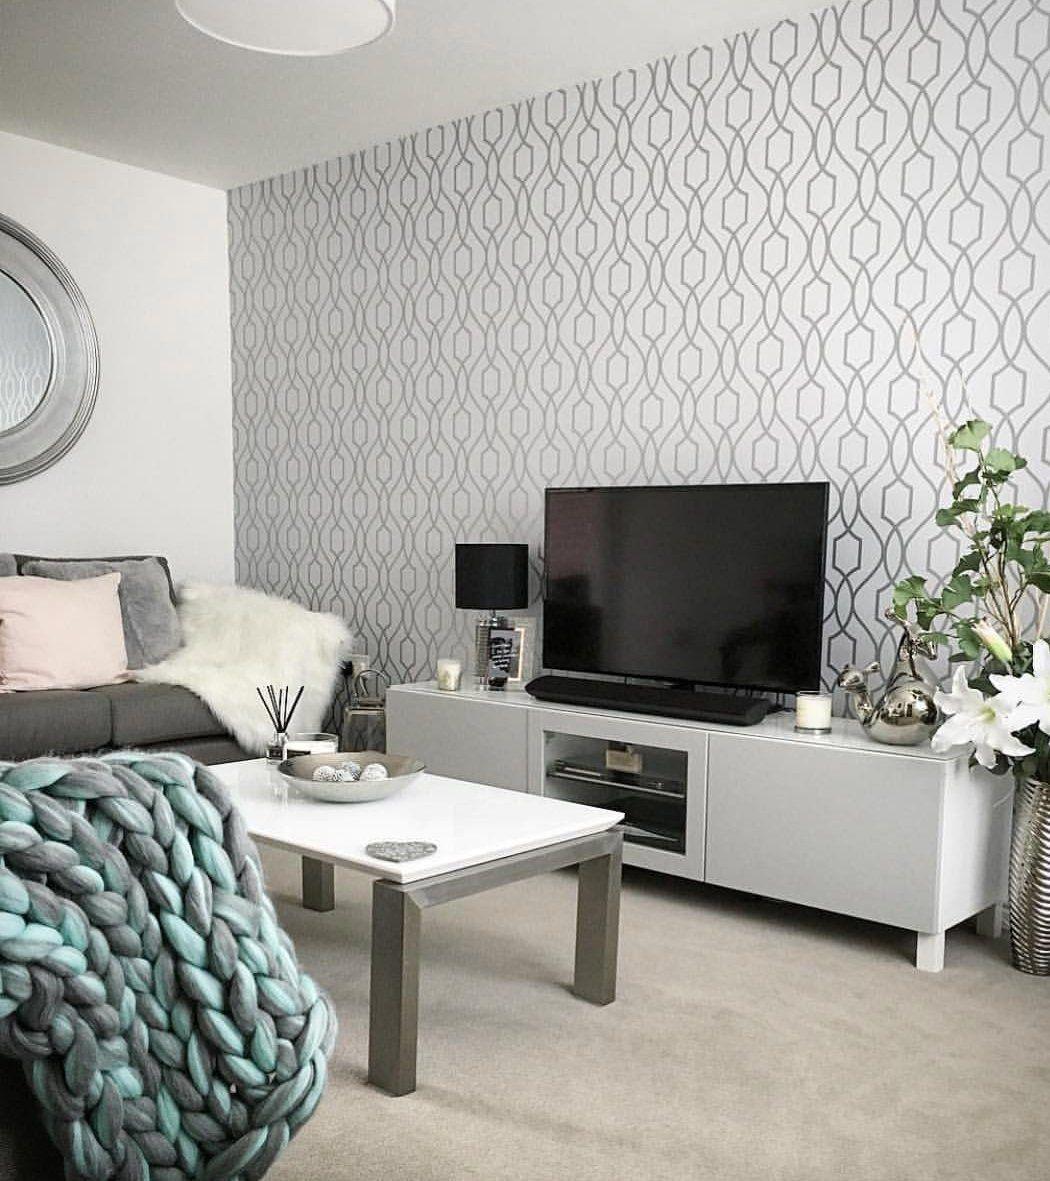 Wm4199501 Wallpaper White Gray Silver Geometric Trellis Metallic 3d Feature Wall Living Room Living Room White Feature Wall Wallpaper #wallpaper #ideas #for #living #room #feature #wall